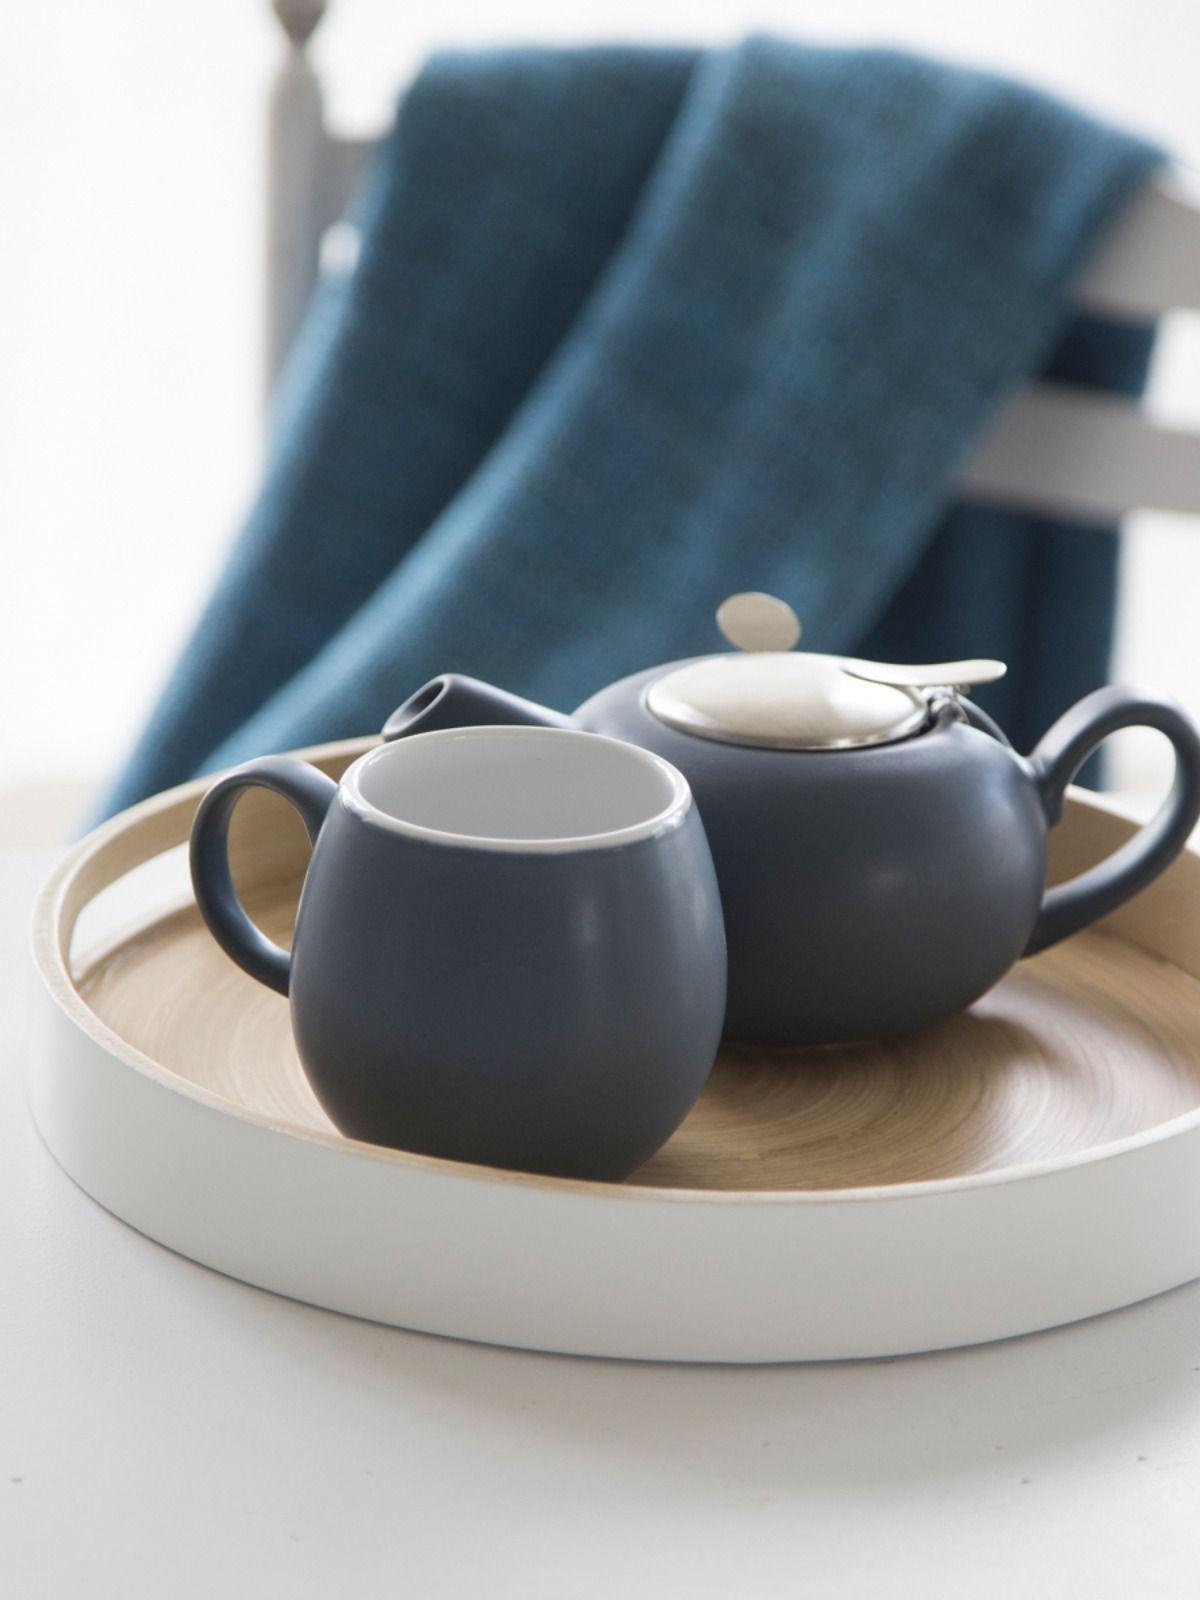 Mug en céramique bleu canard | Vaisselle design, Service de table moderne, Vaisselle